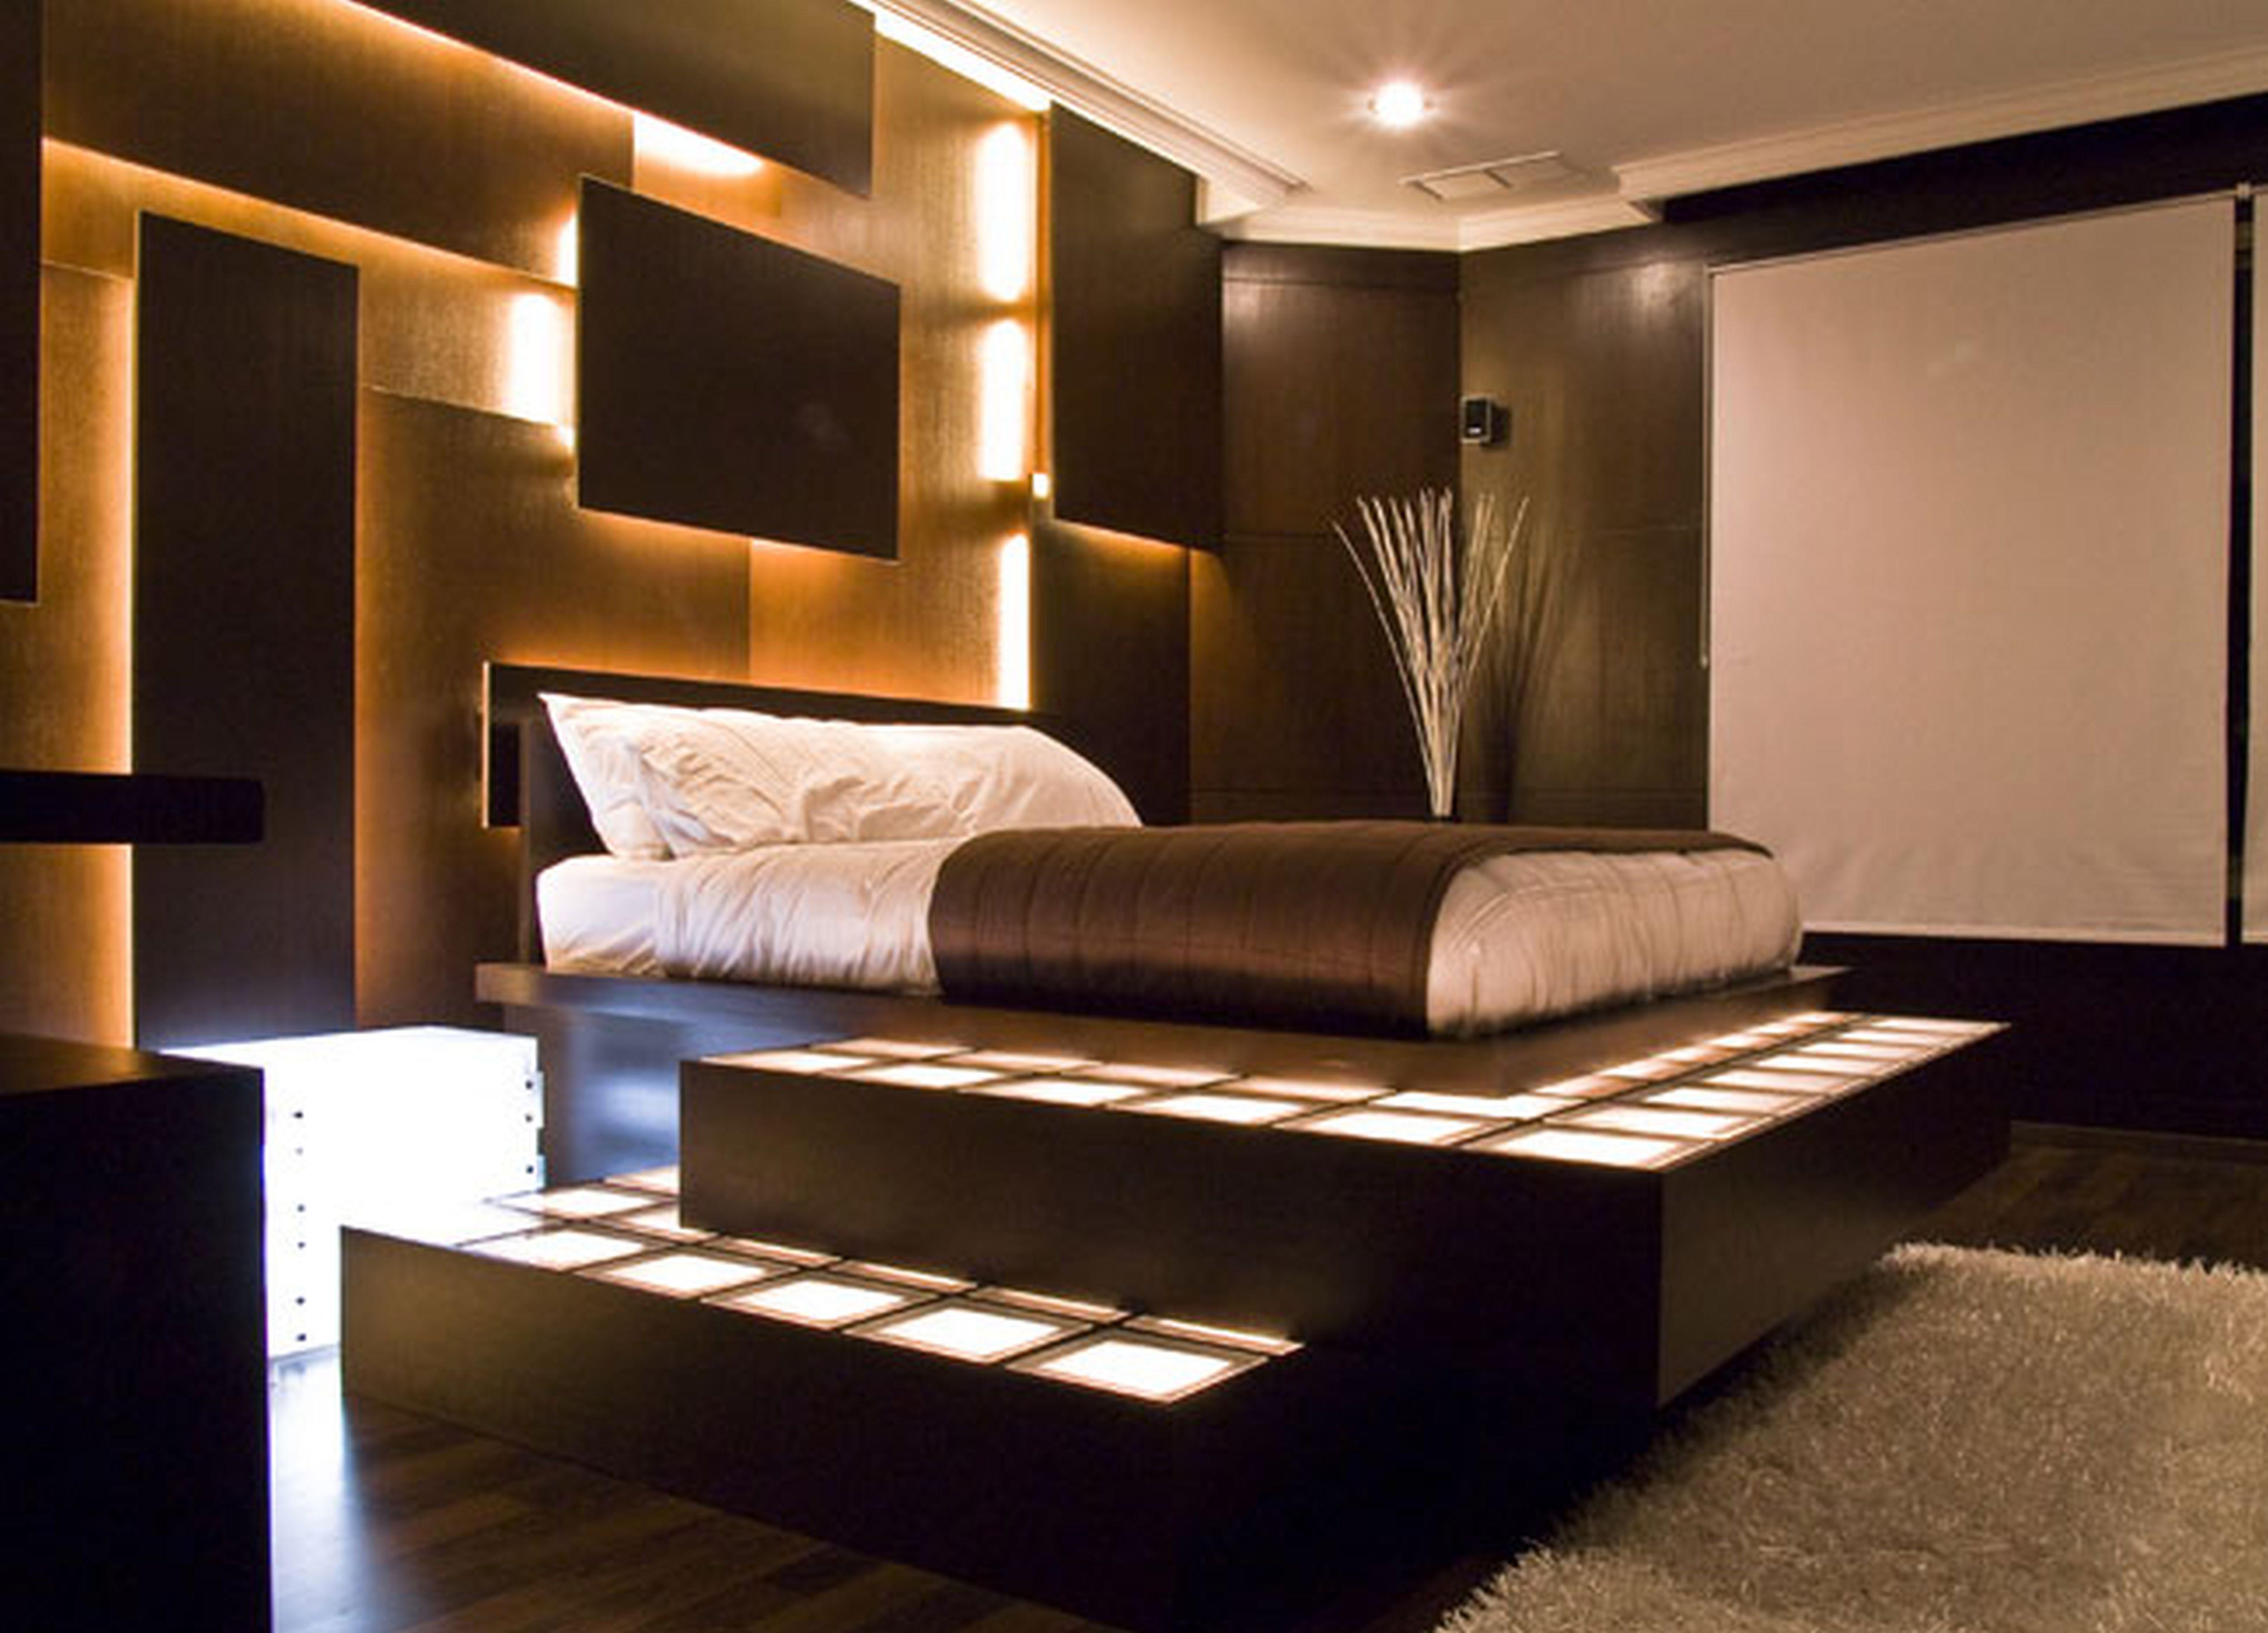 Modern bedroom renovation - ideas that inspire